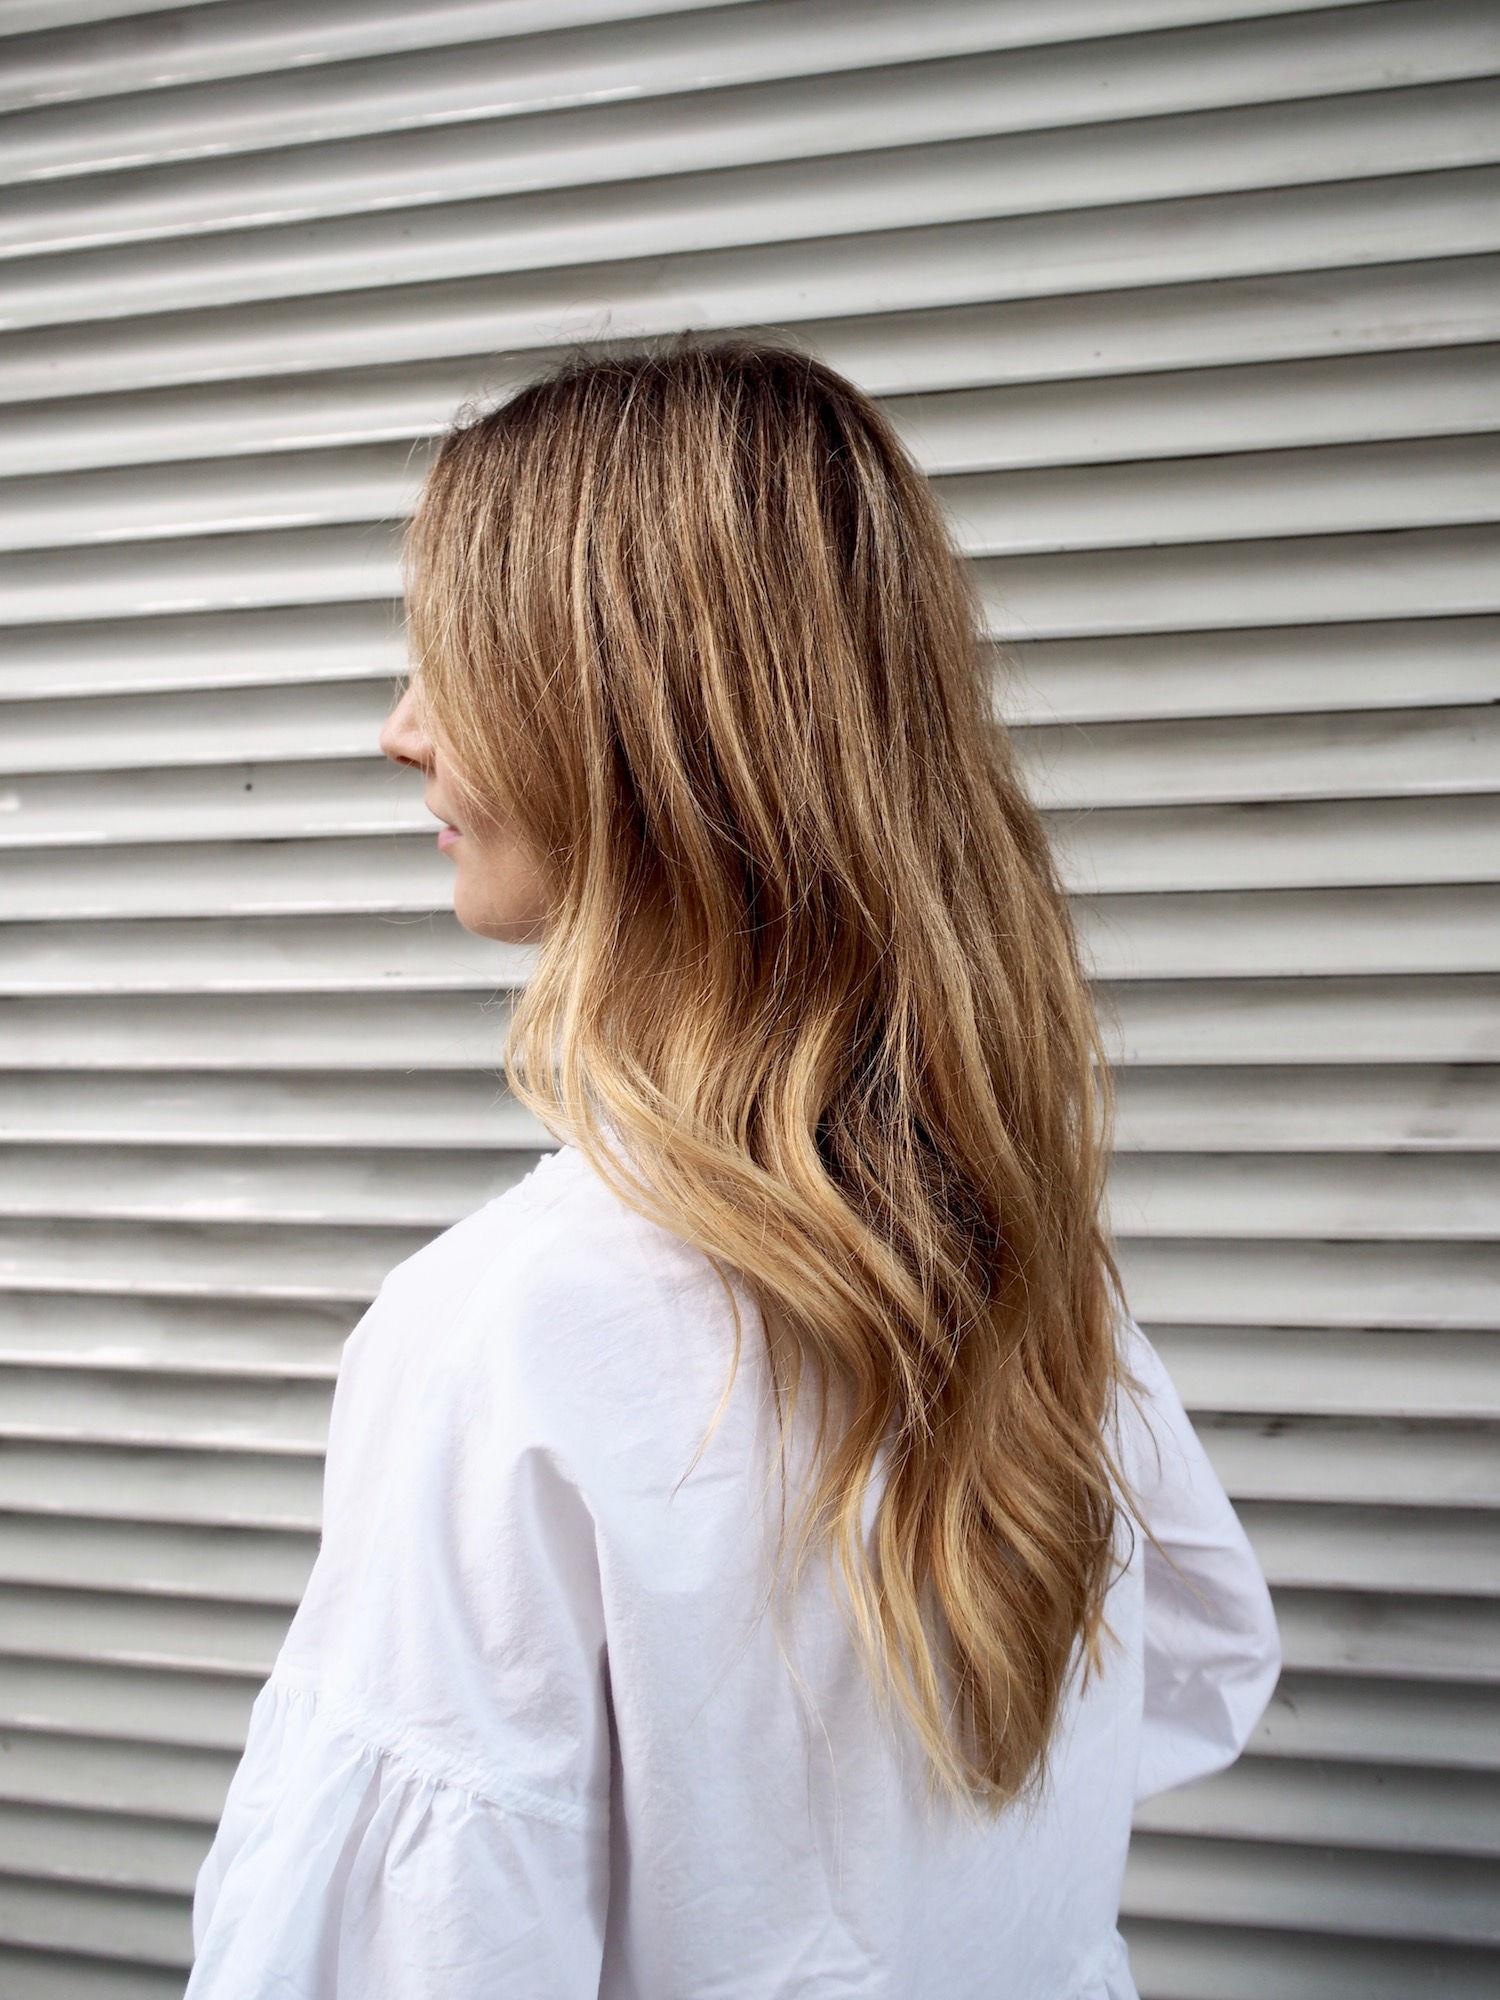 Beautyblog Bare Minds Elina Neumann gesunde Haare gute Haarpflege